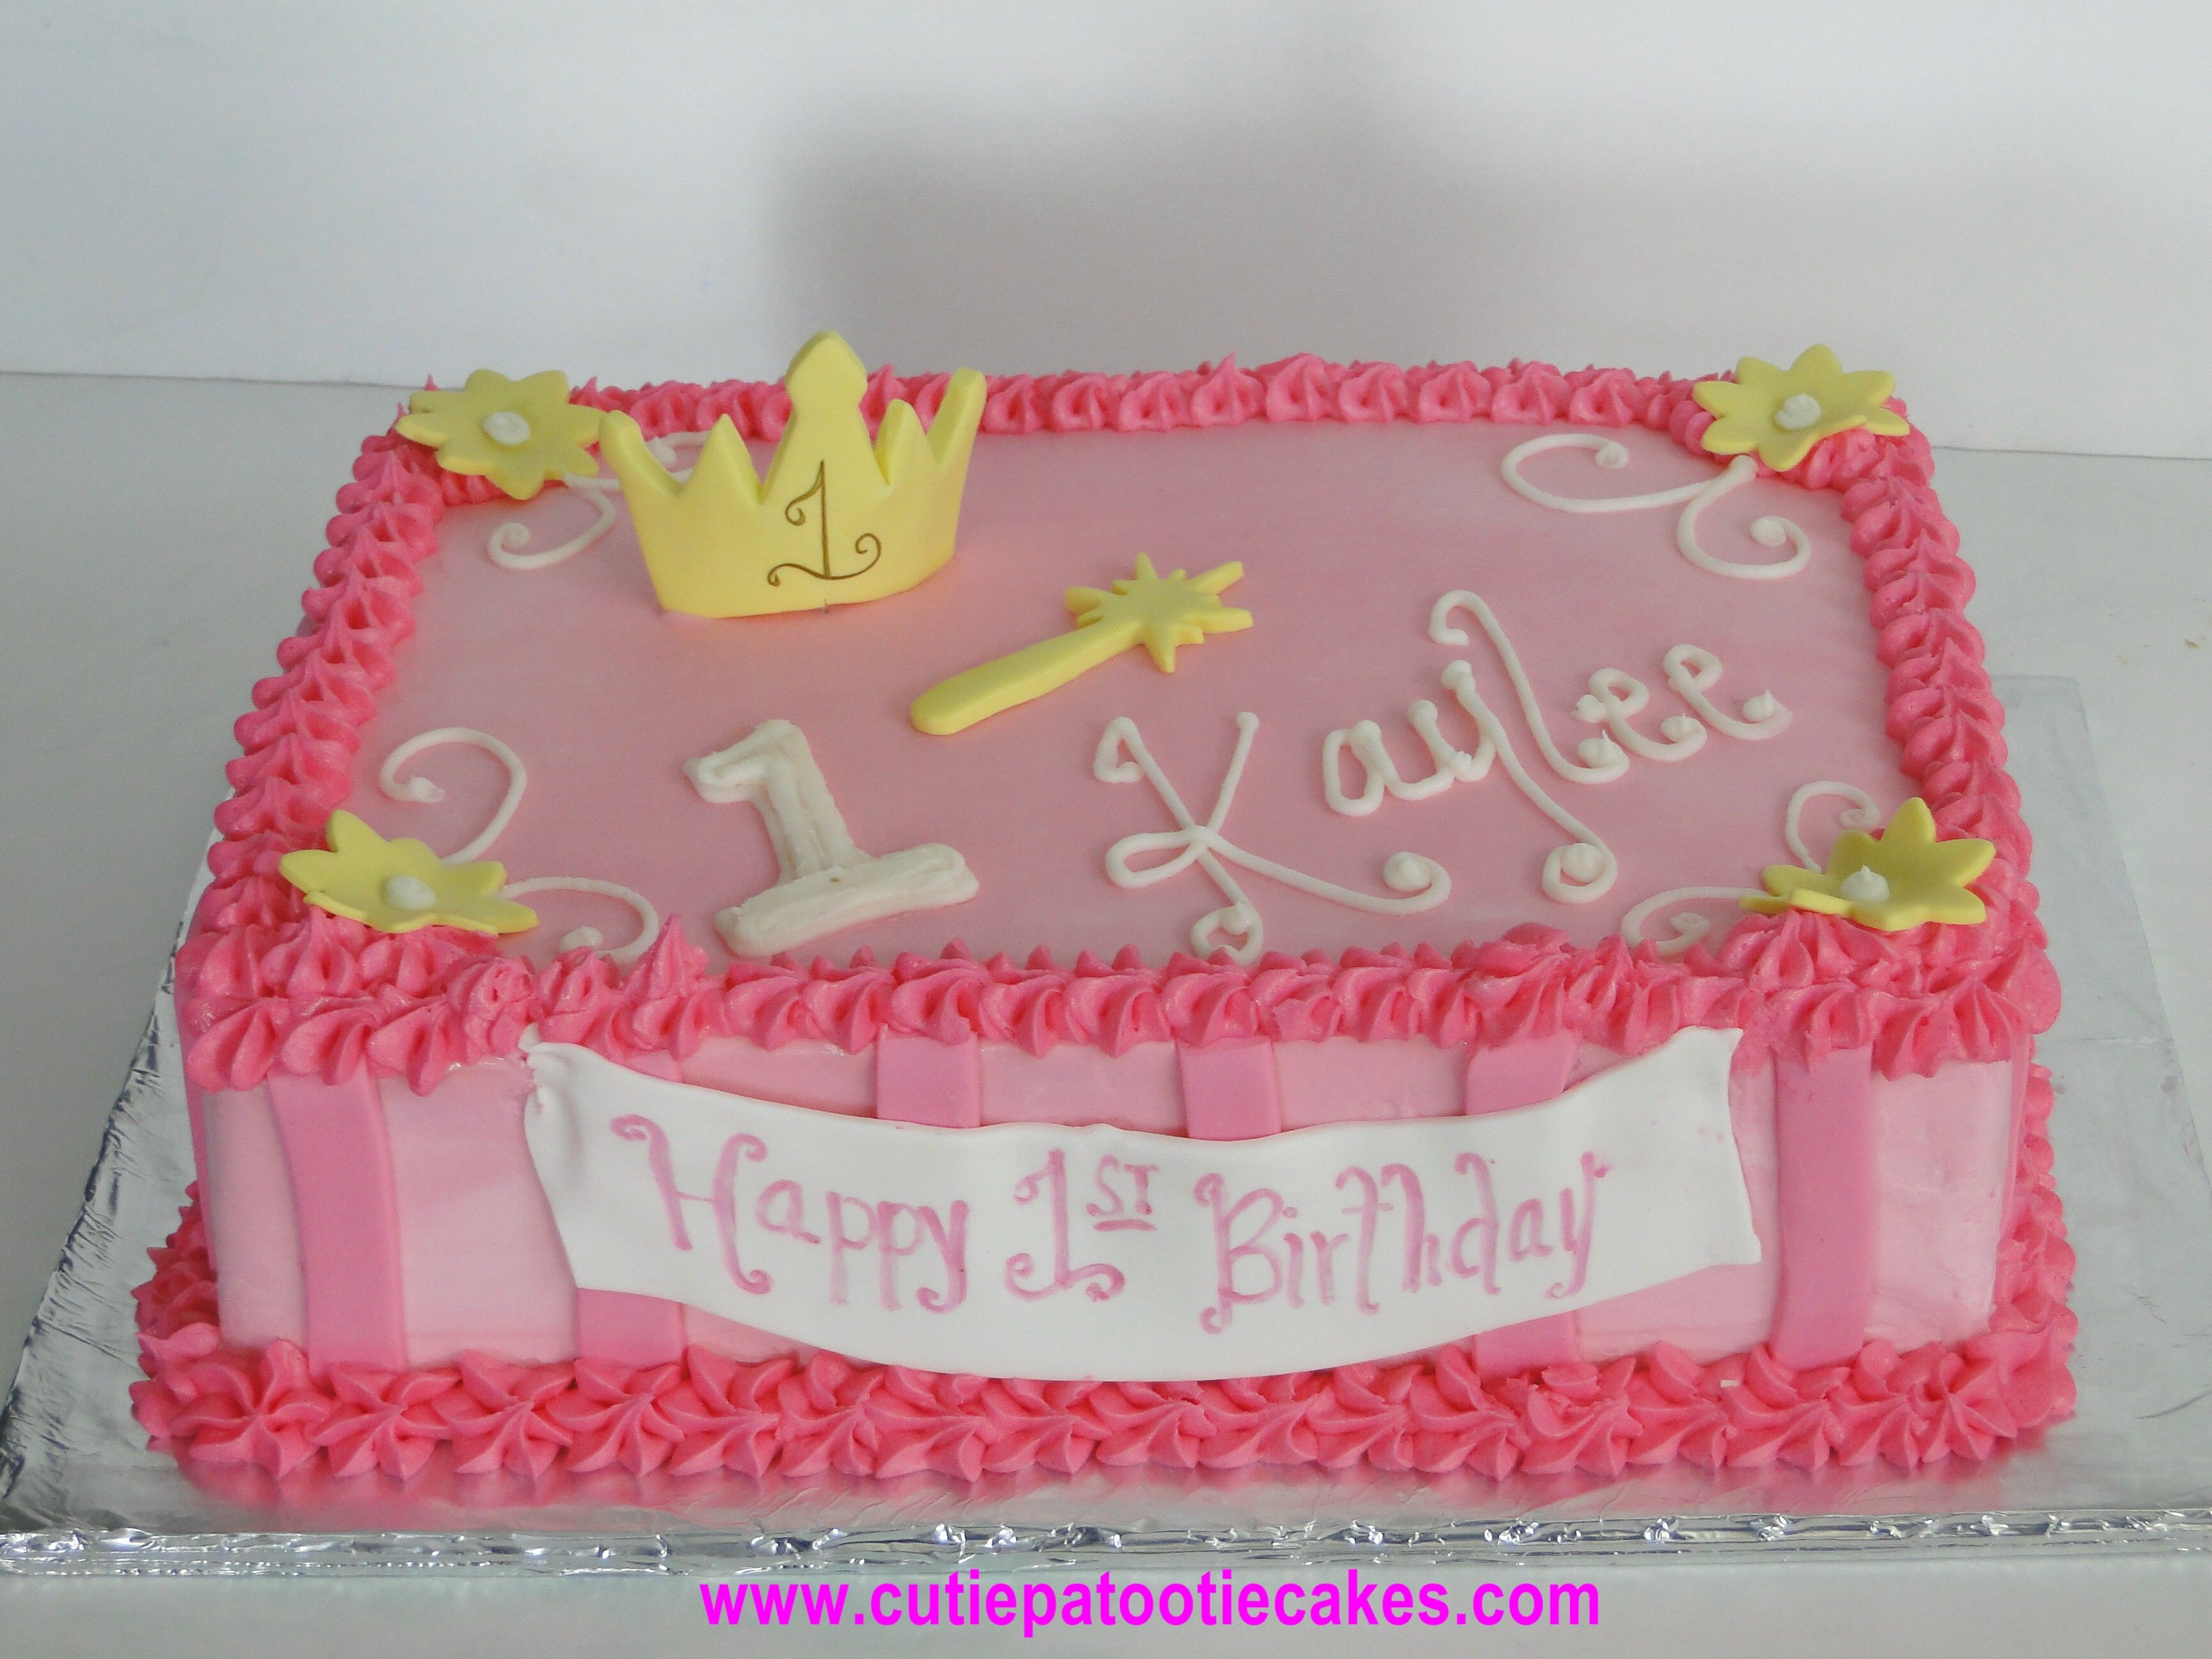 Princess Sheet Cake 1 Year Old Birthday Cake Childrens Birthday